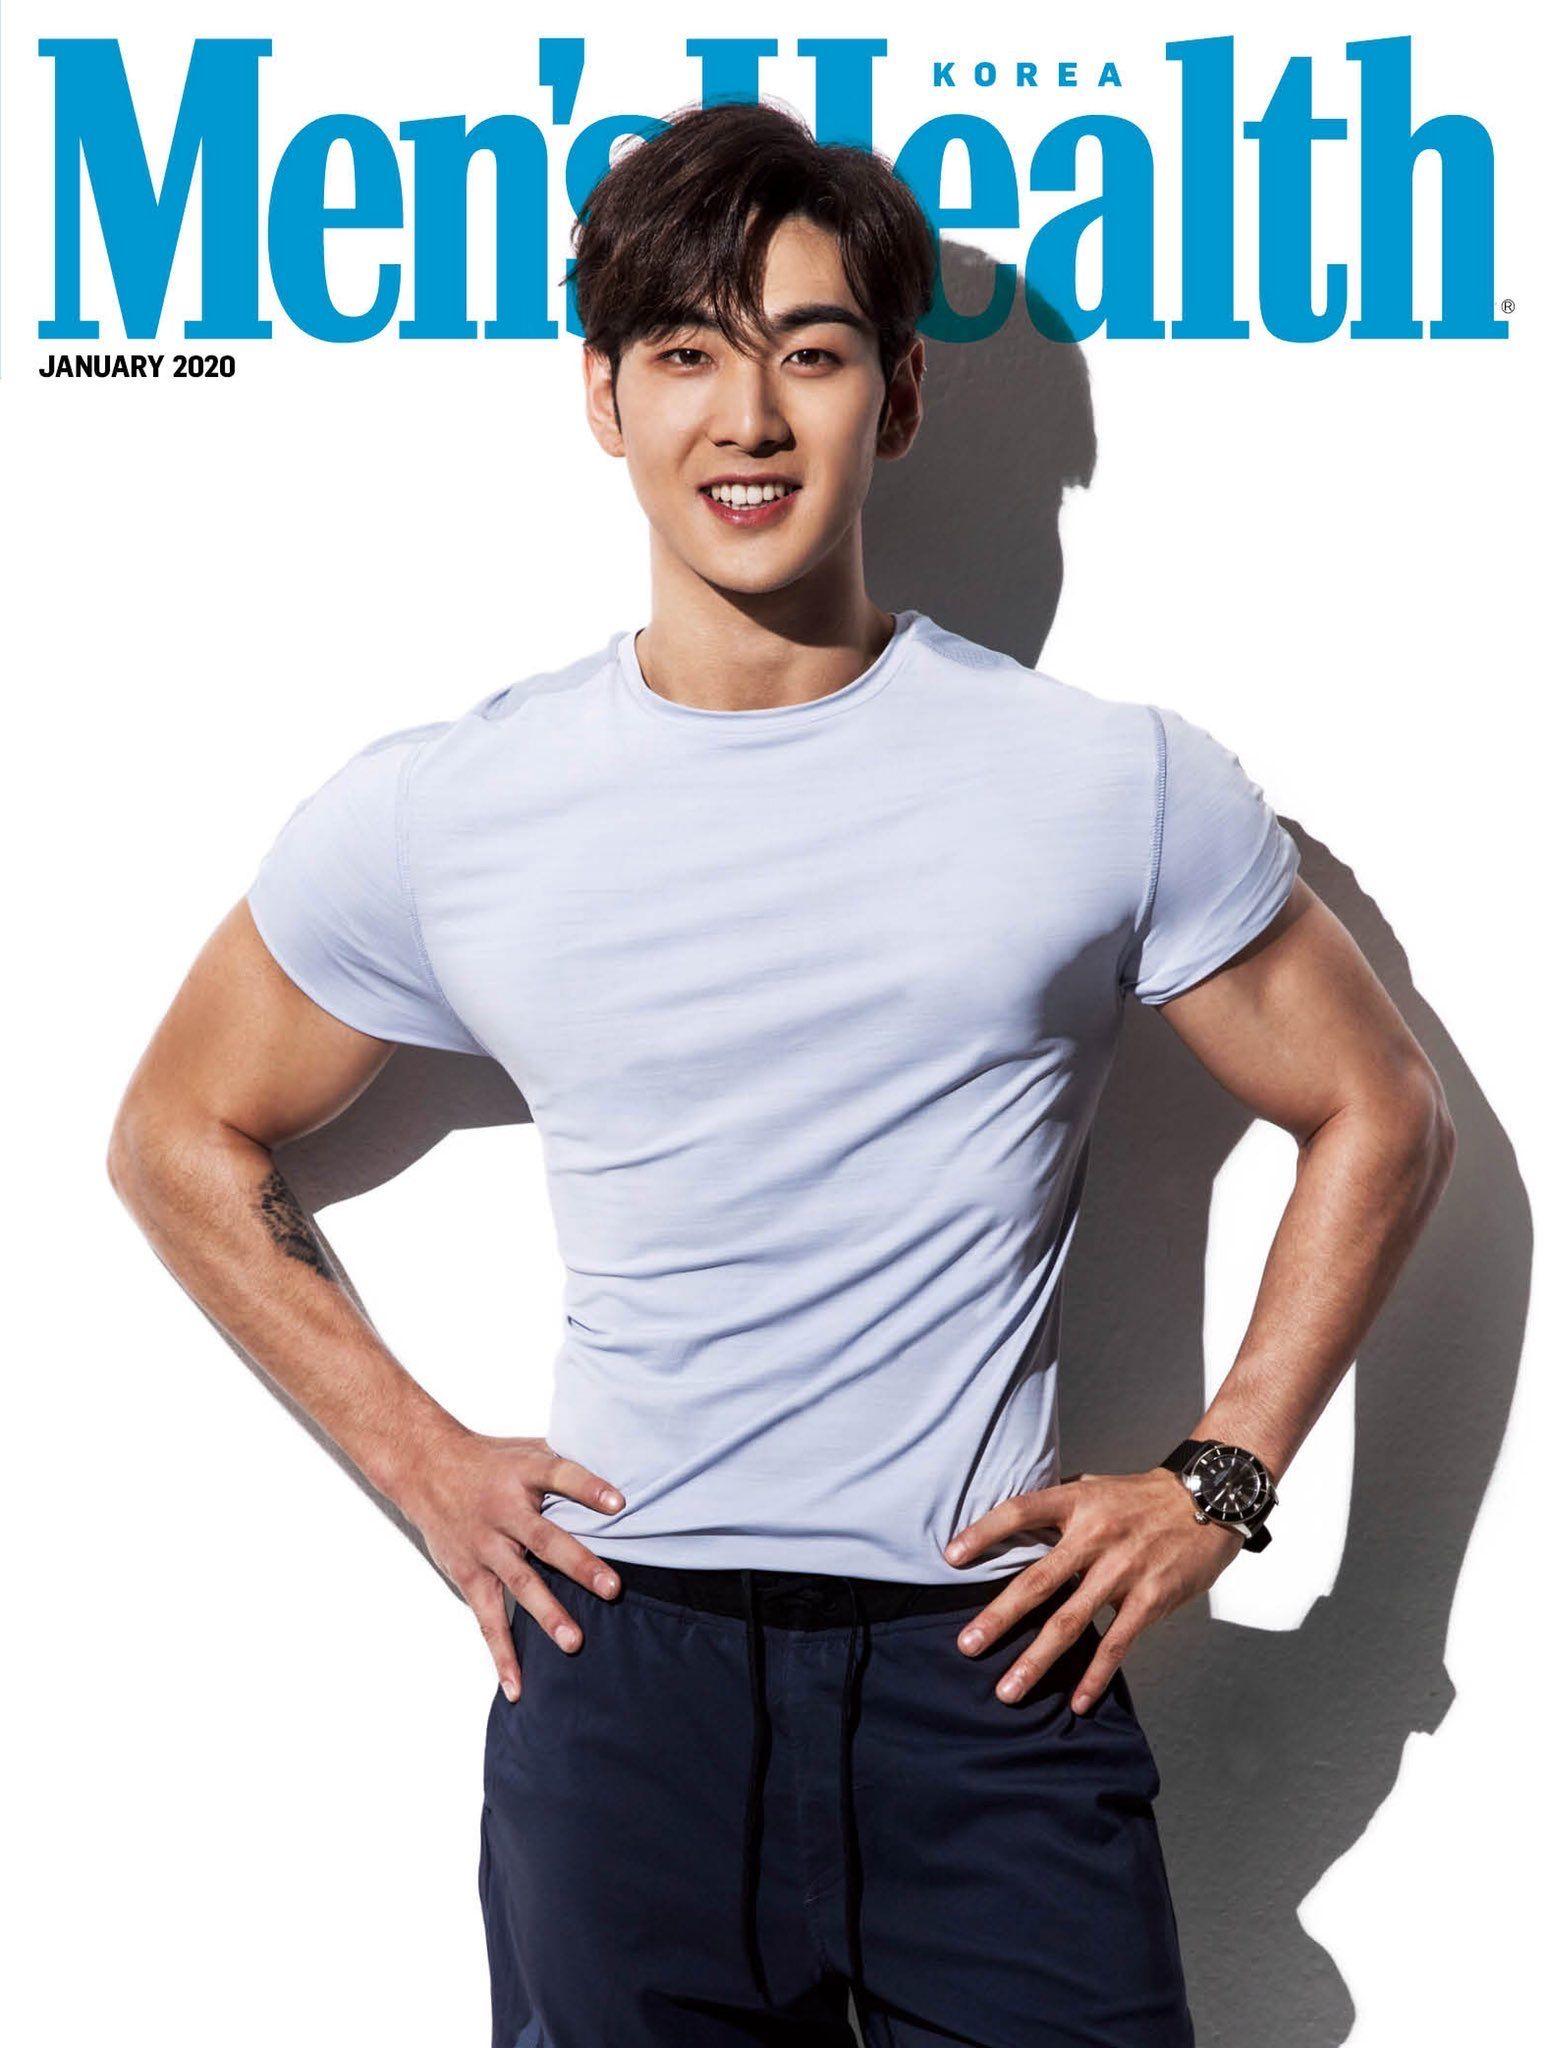 NUEST | BAEKHO | Mens health magazine, Men's health, Workout routine for men